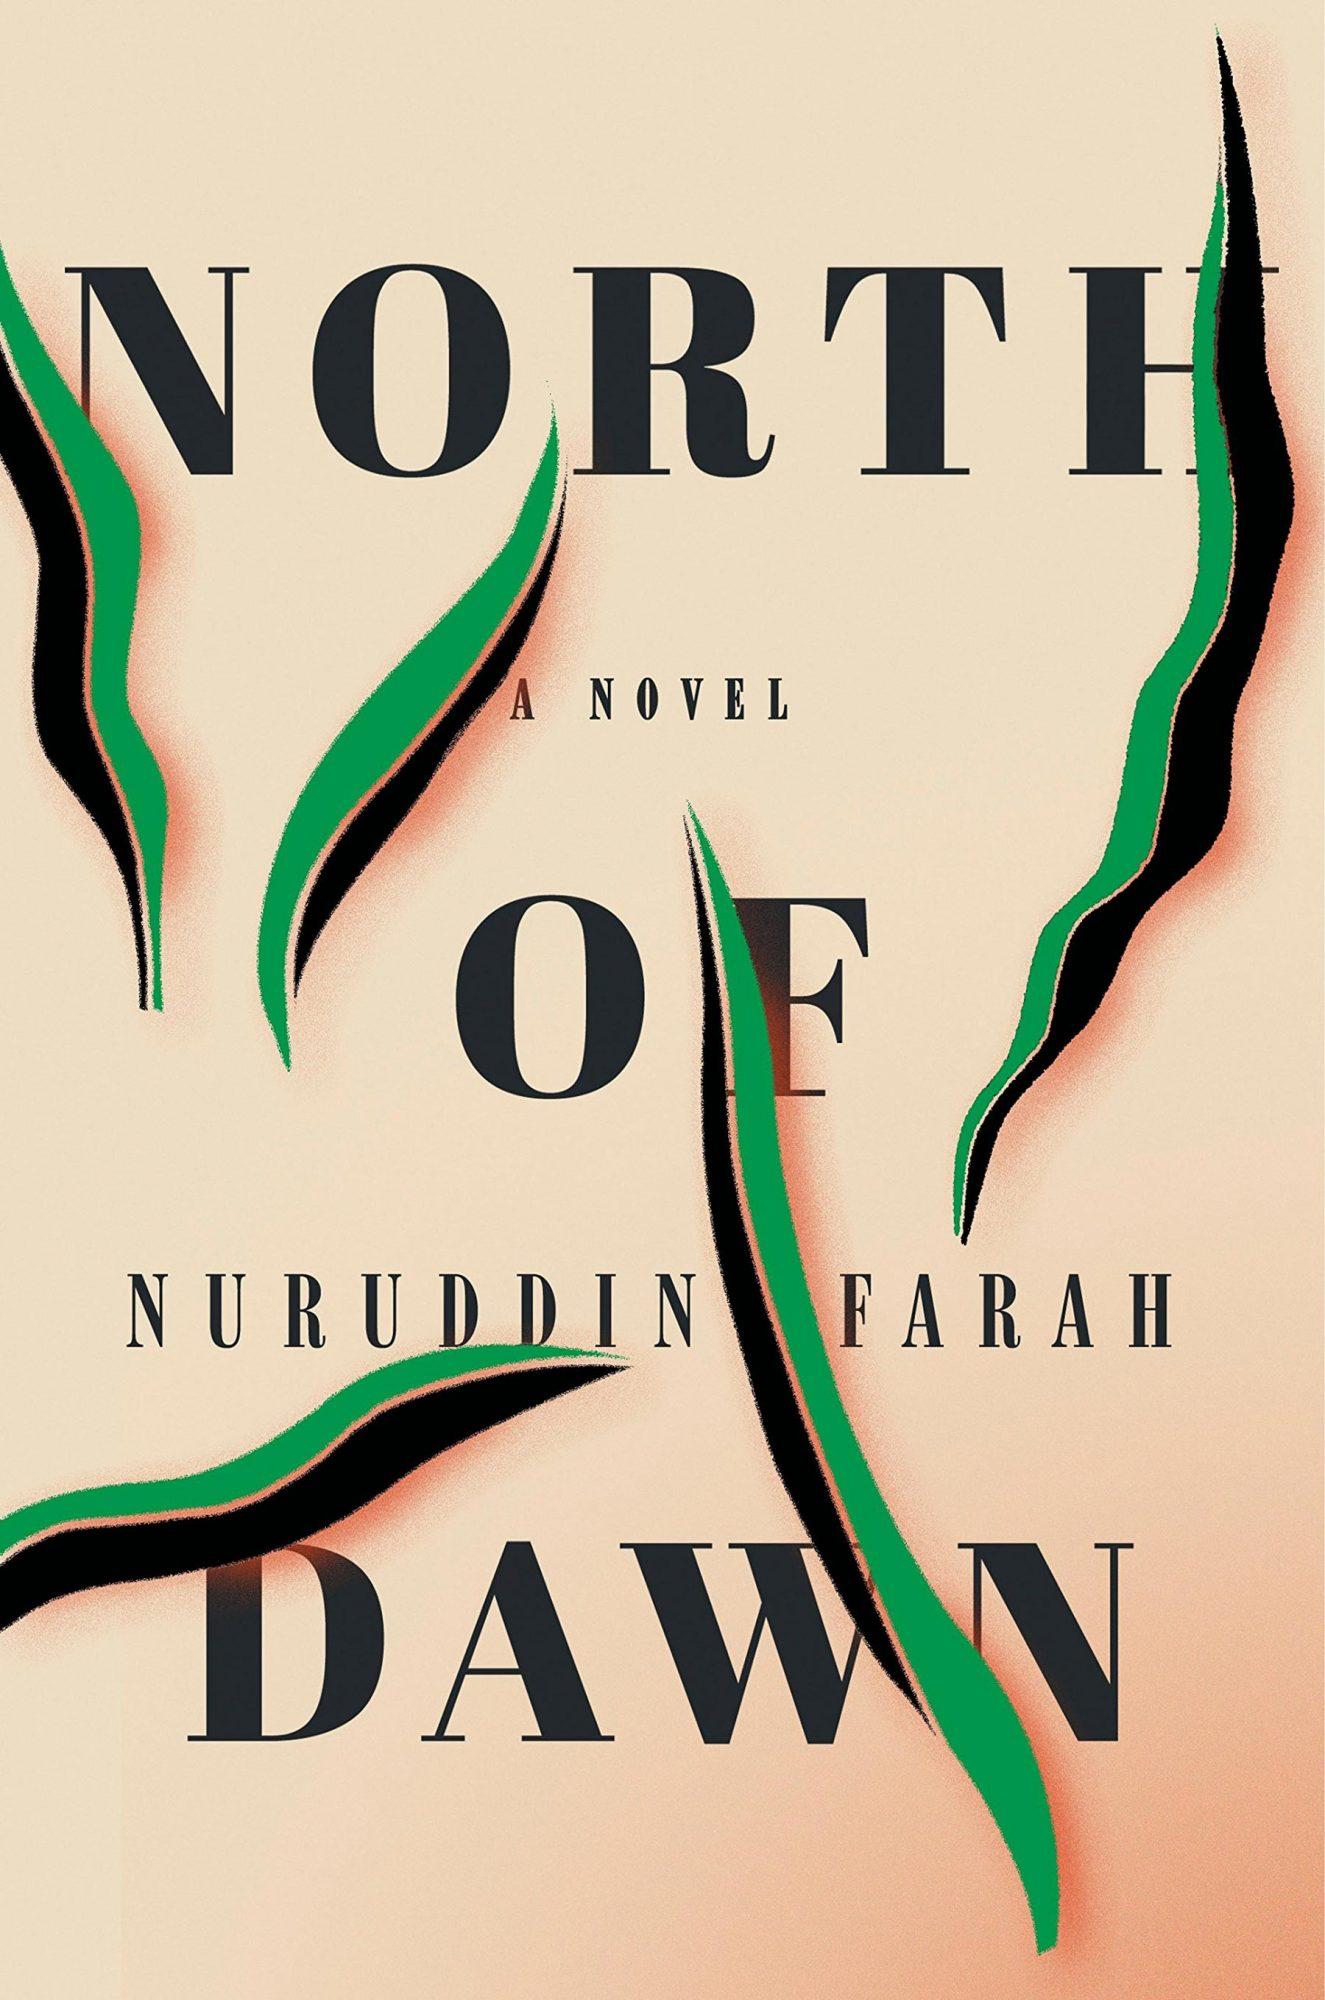 North of Dawn by Nuruddin FarahCredit: Riverhead Books